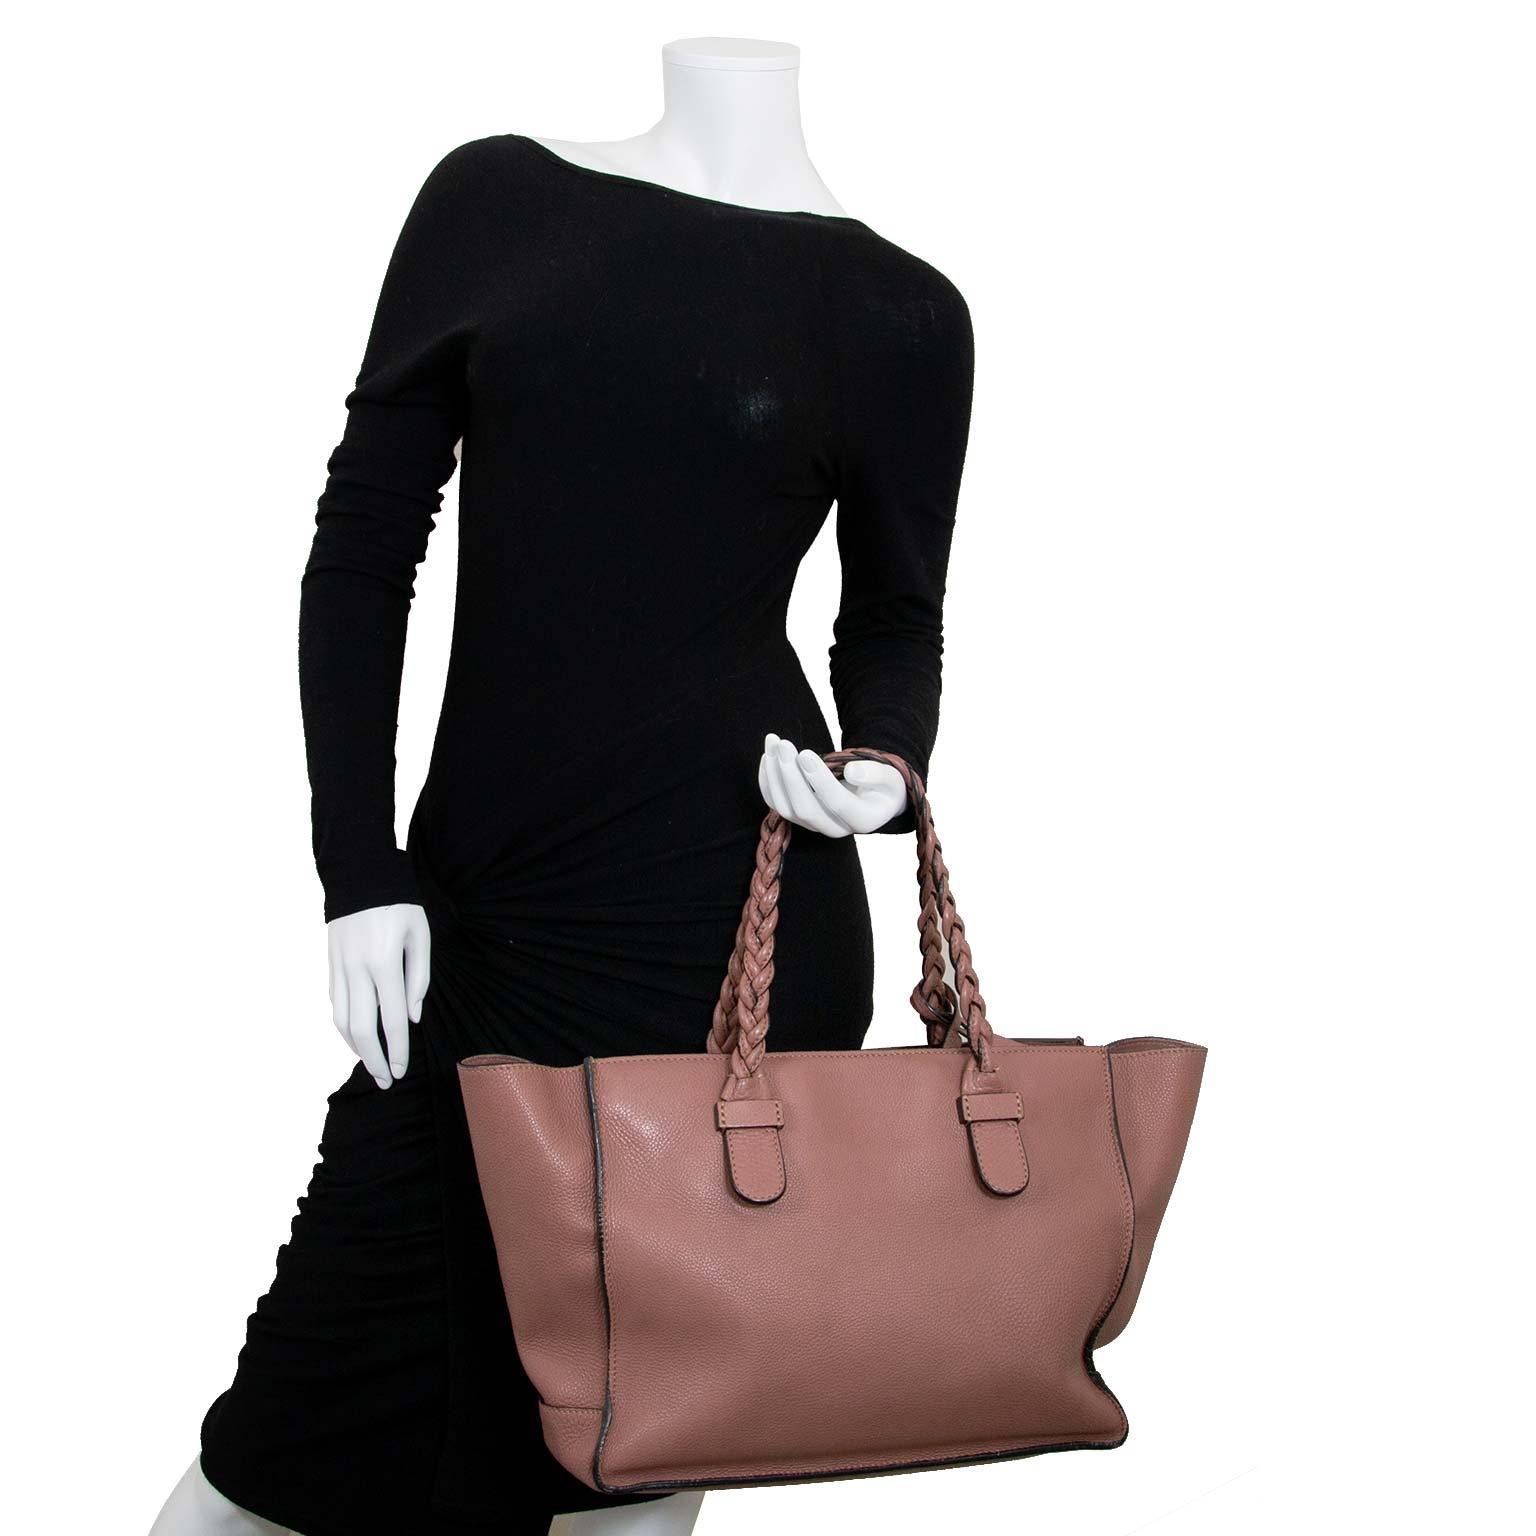 valentino garavani braided handle tote now for sale at labellov vintage fashion webshop belgium